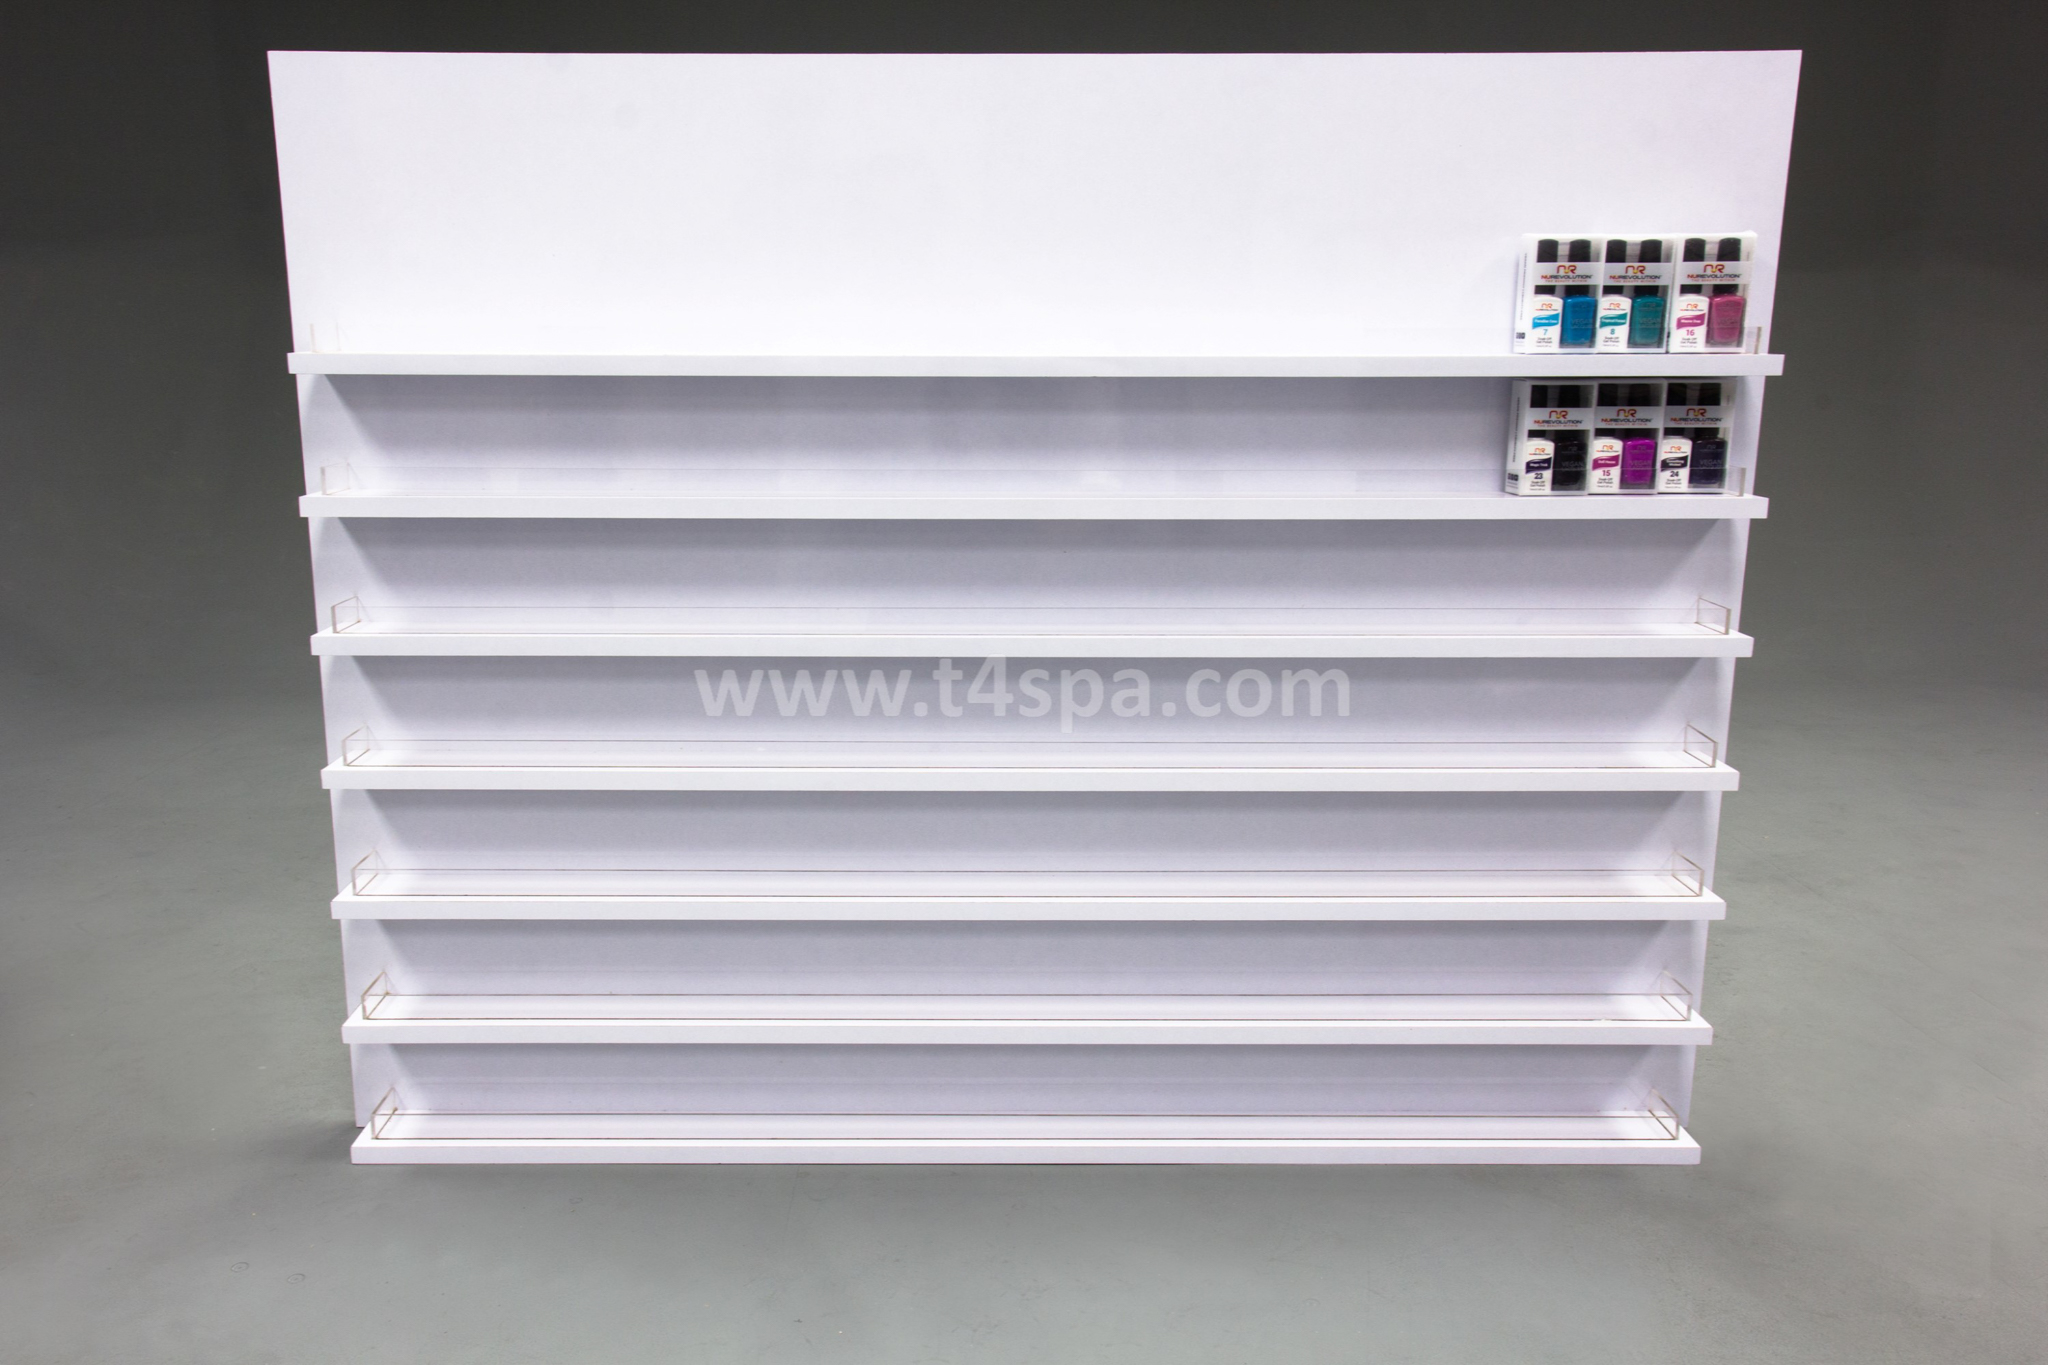 TD-9031 Wall Polish Rack Glossy White Detail (2)